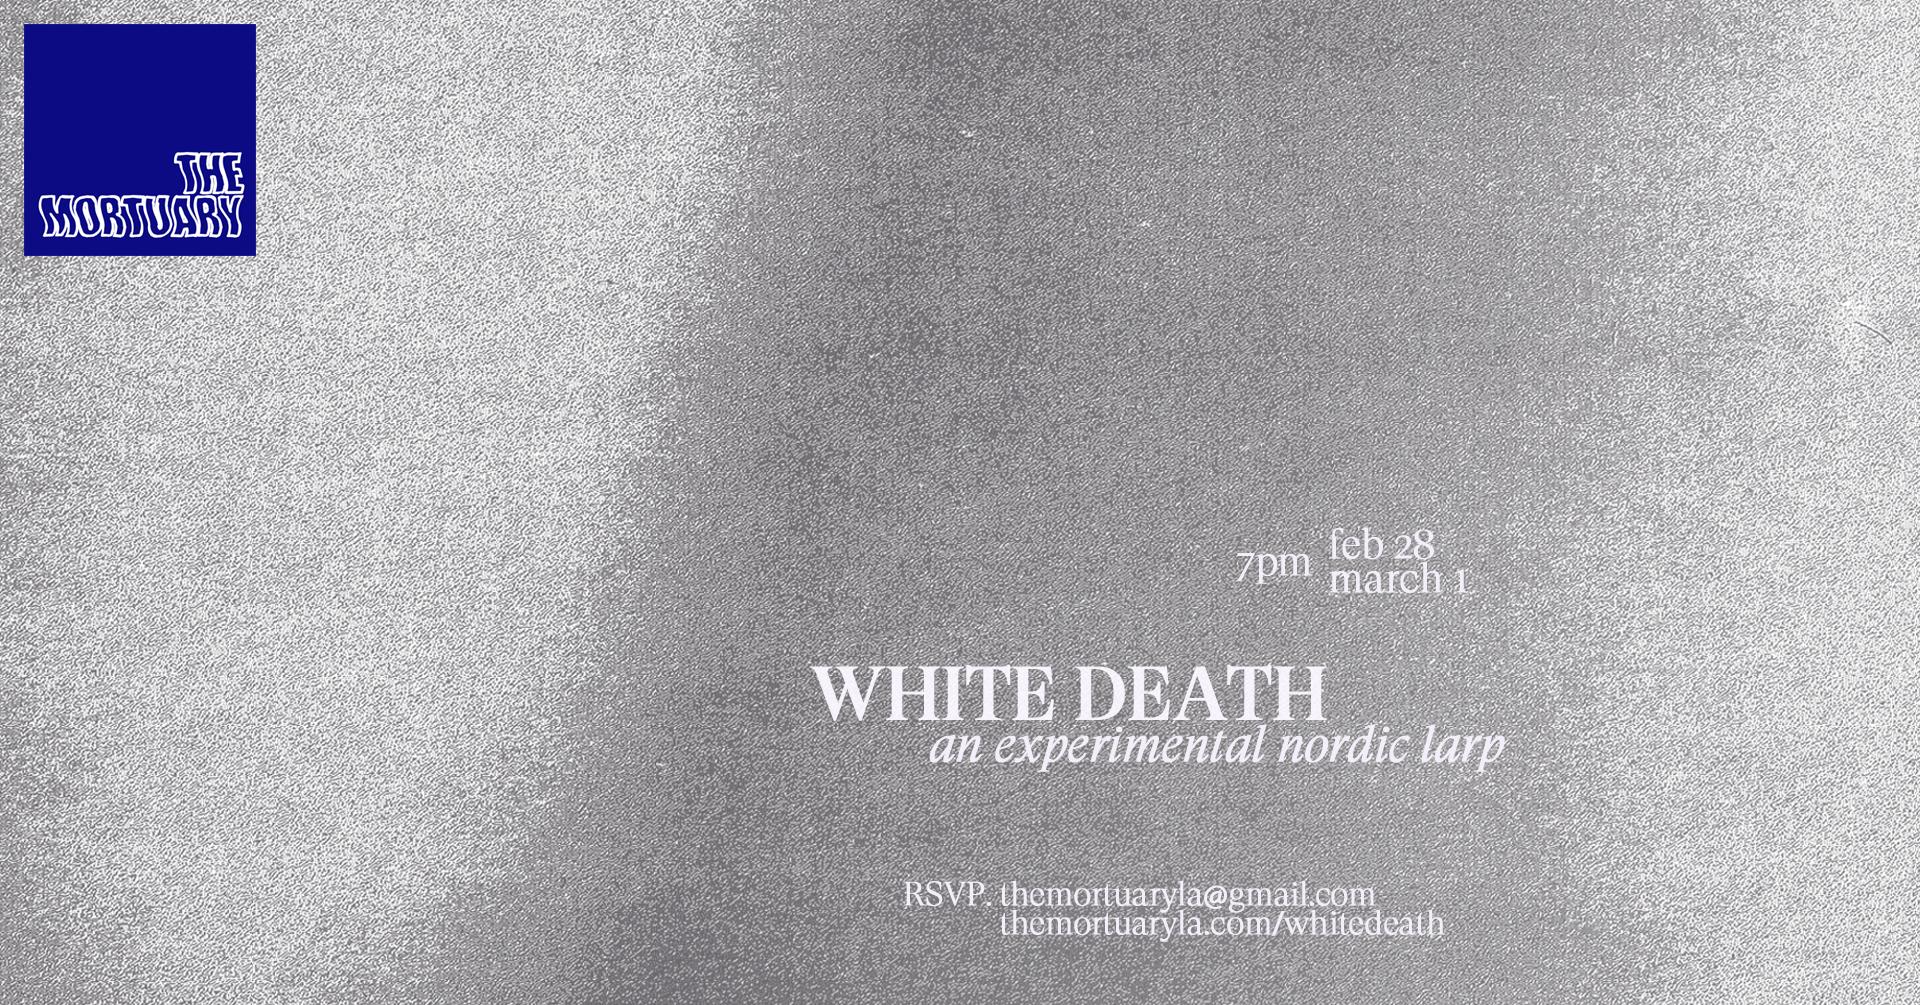 whitedeathfbook.jpg